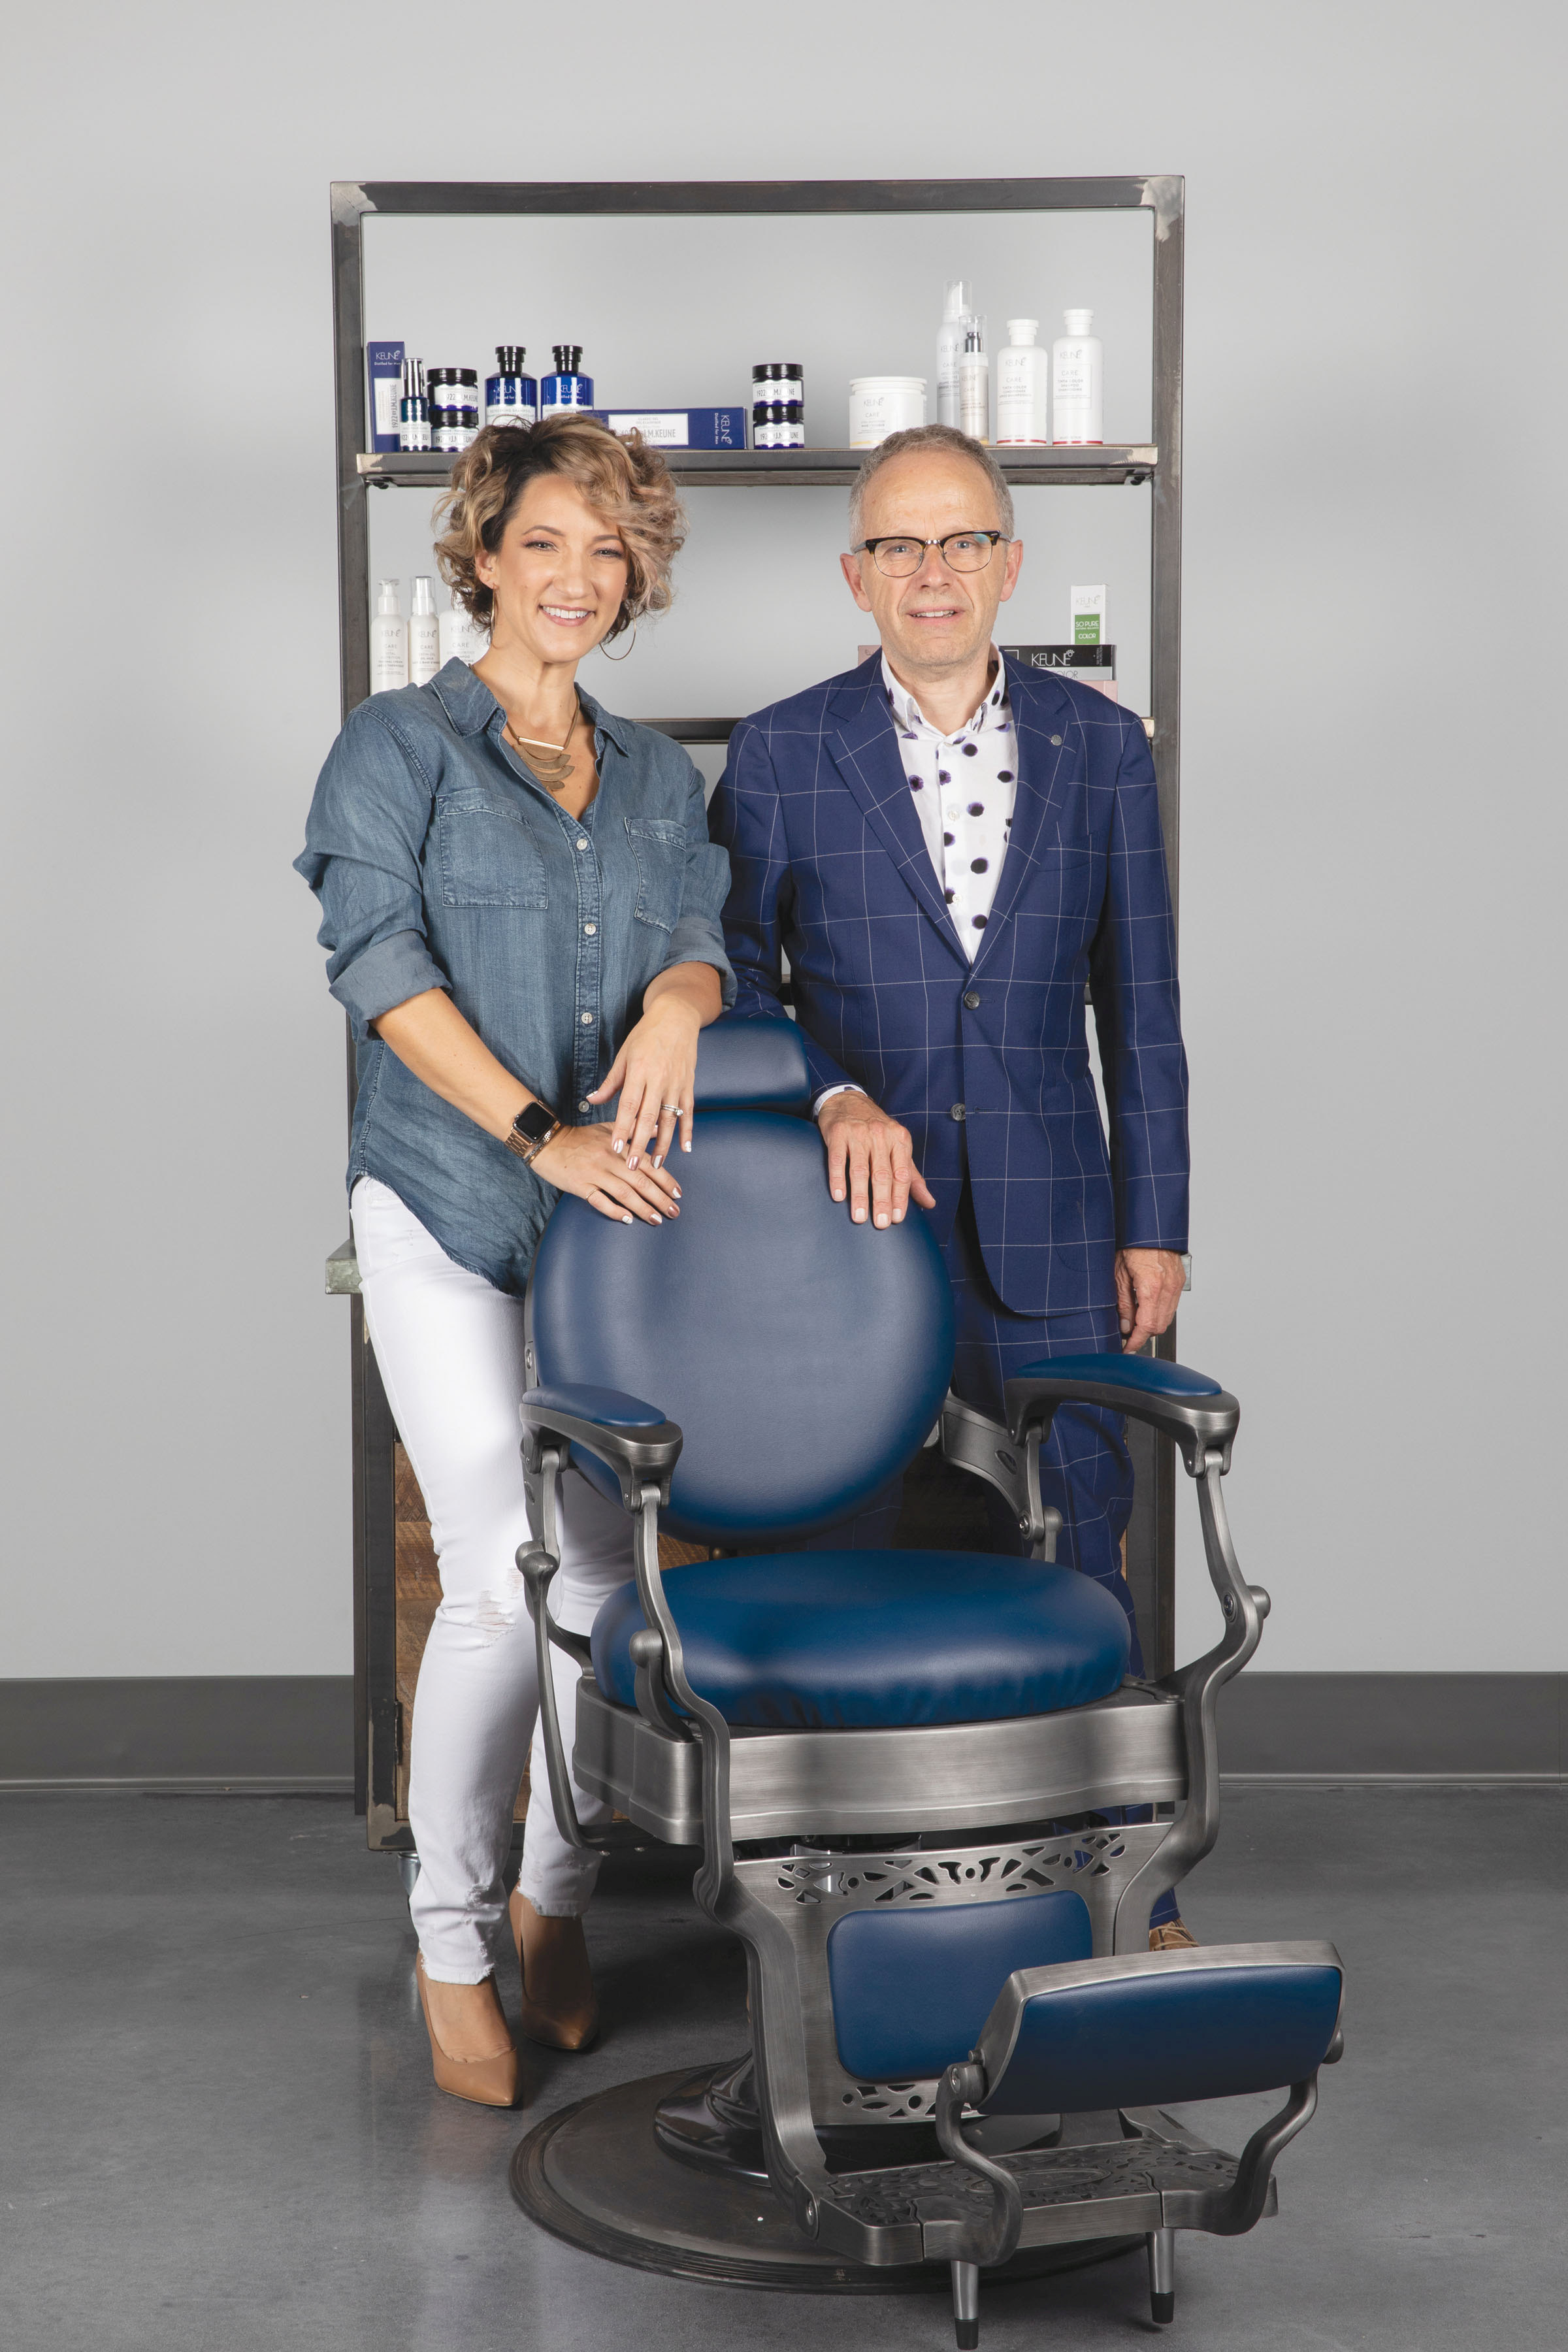 The 5th Annual Salon Today Total Salon Makeover Kicks Off